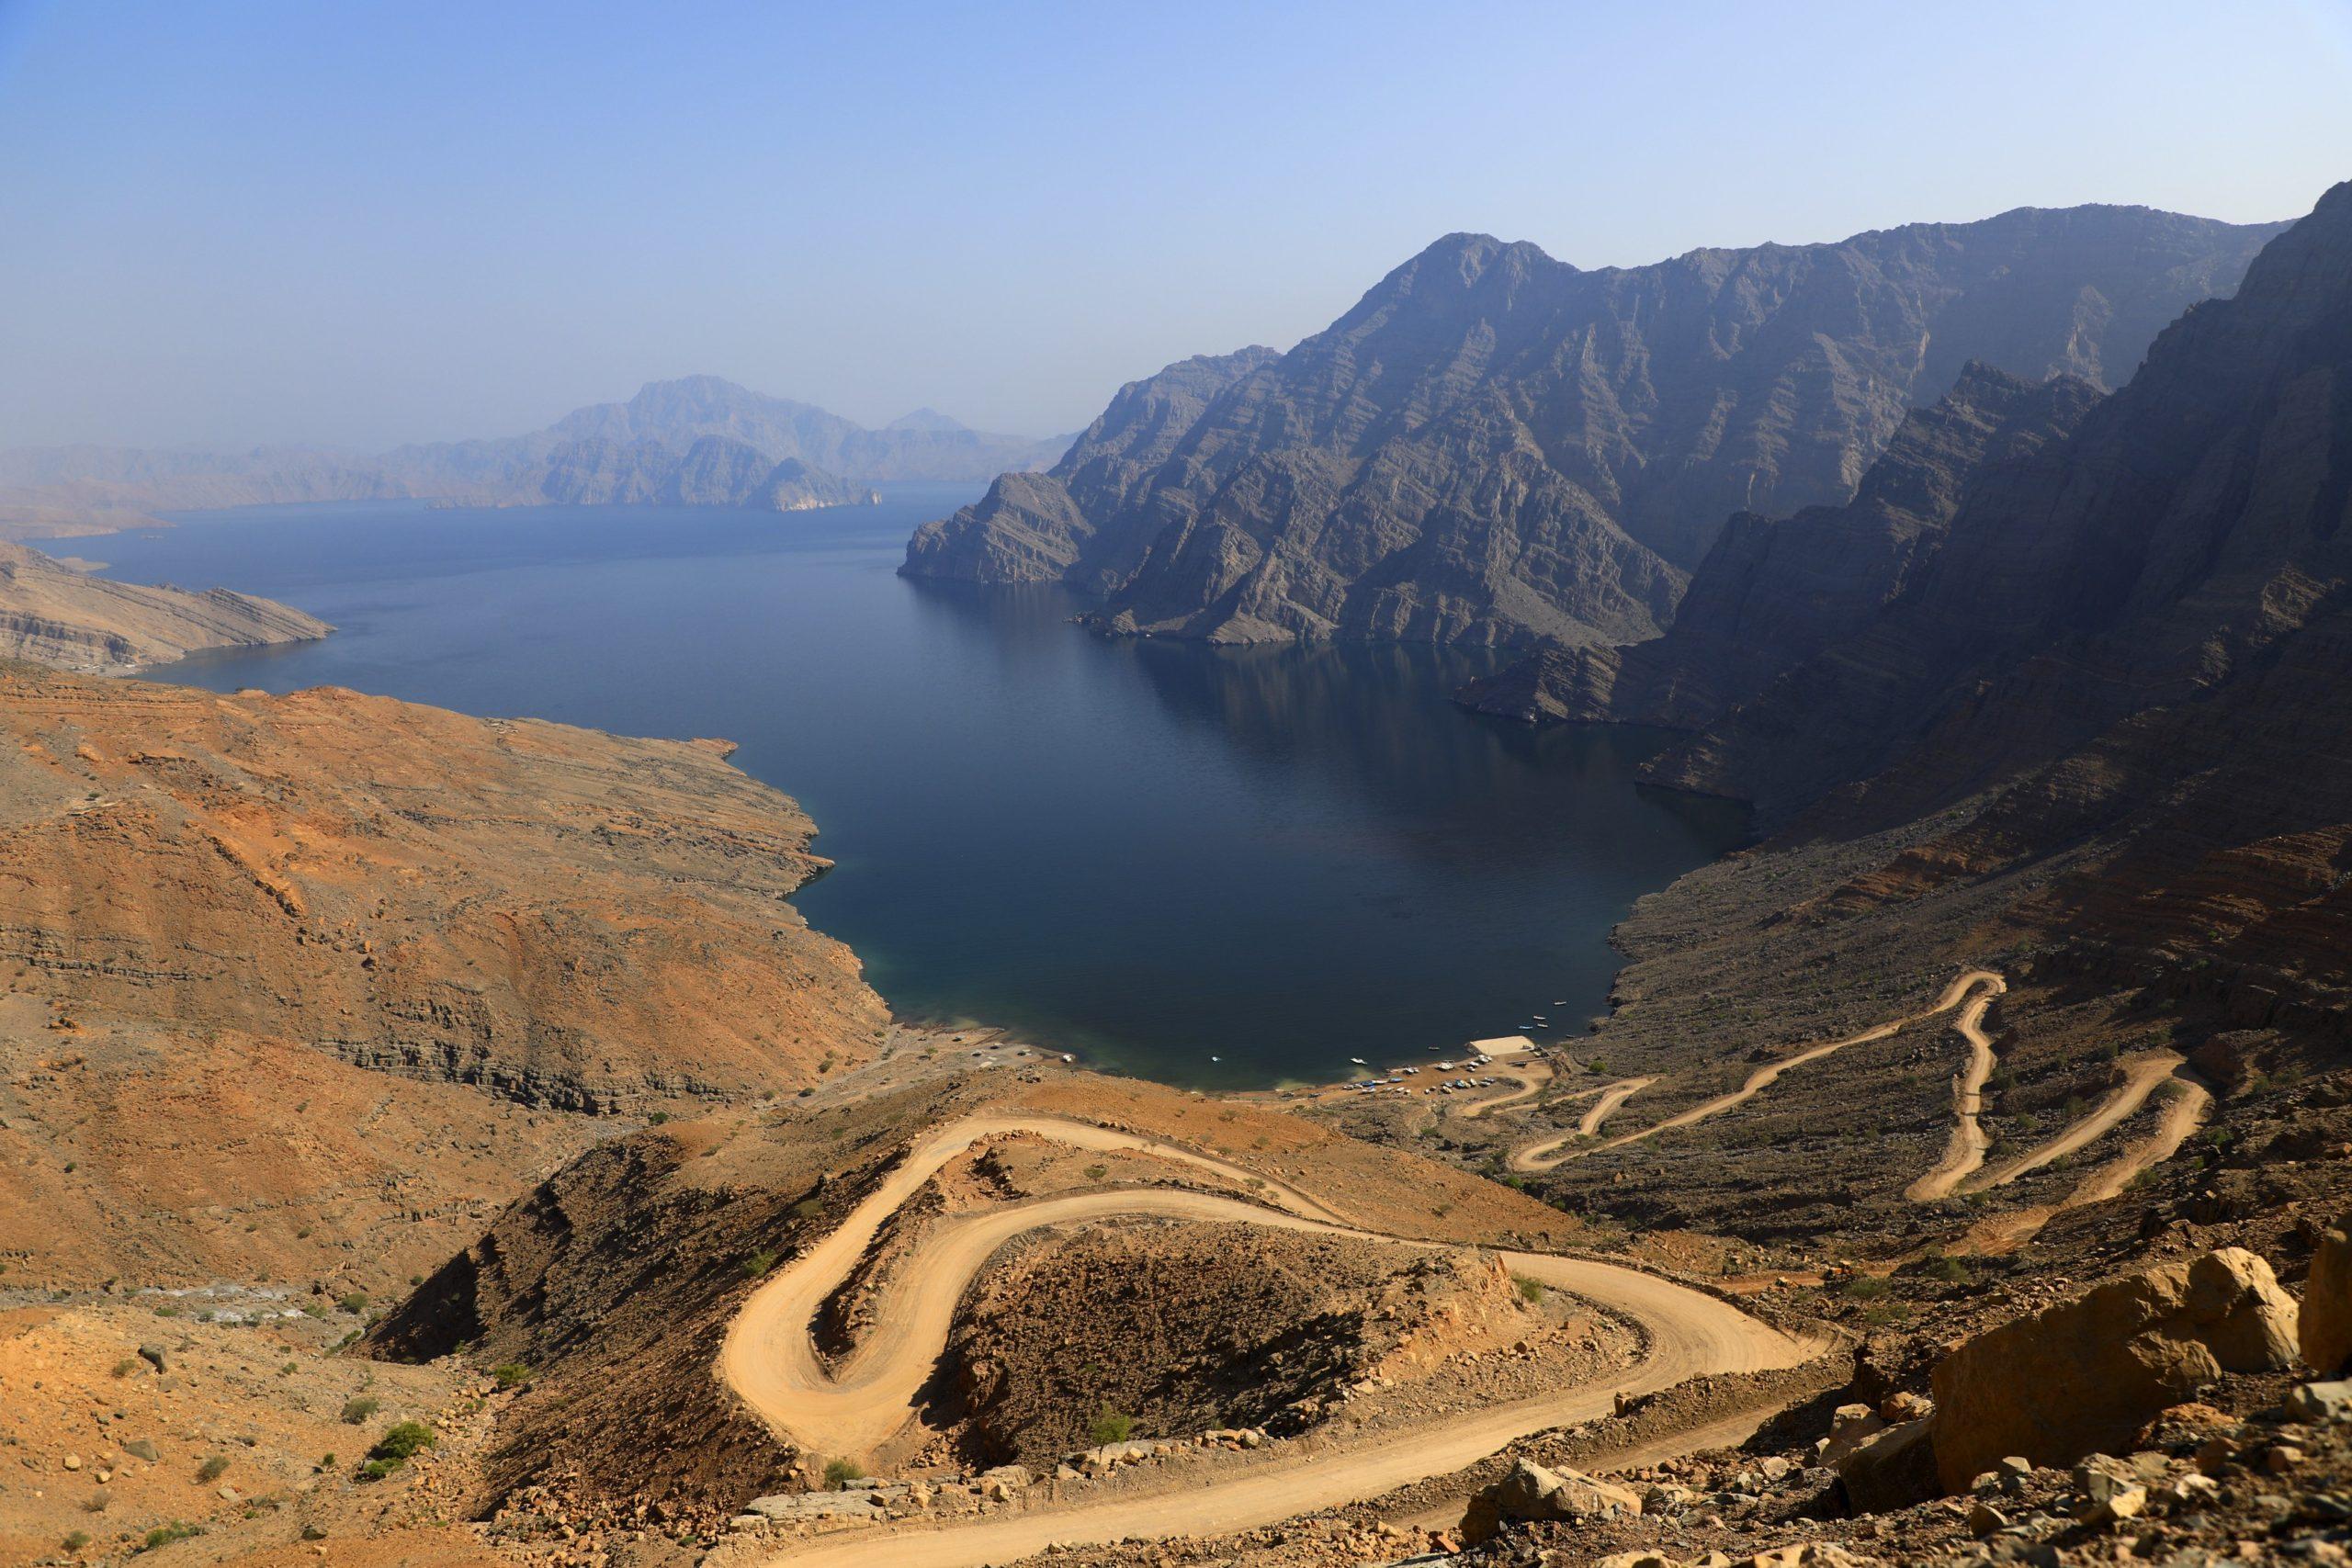 Fjord de Jebel Harim dans la péninsule de Musandam